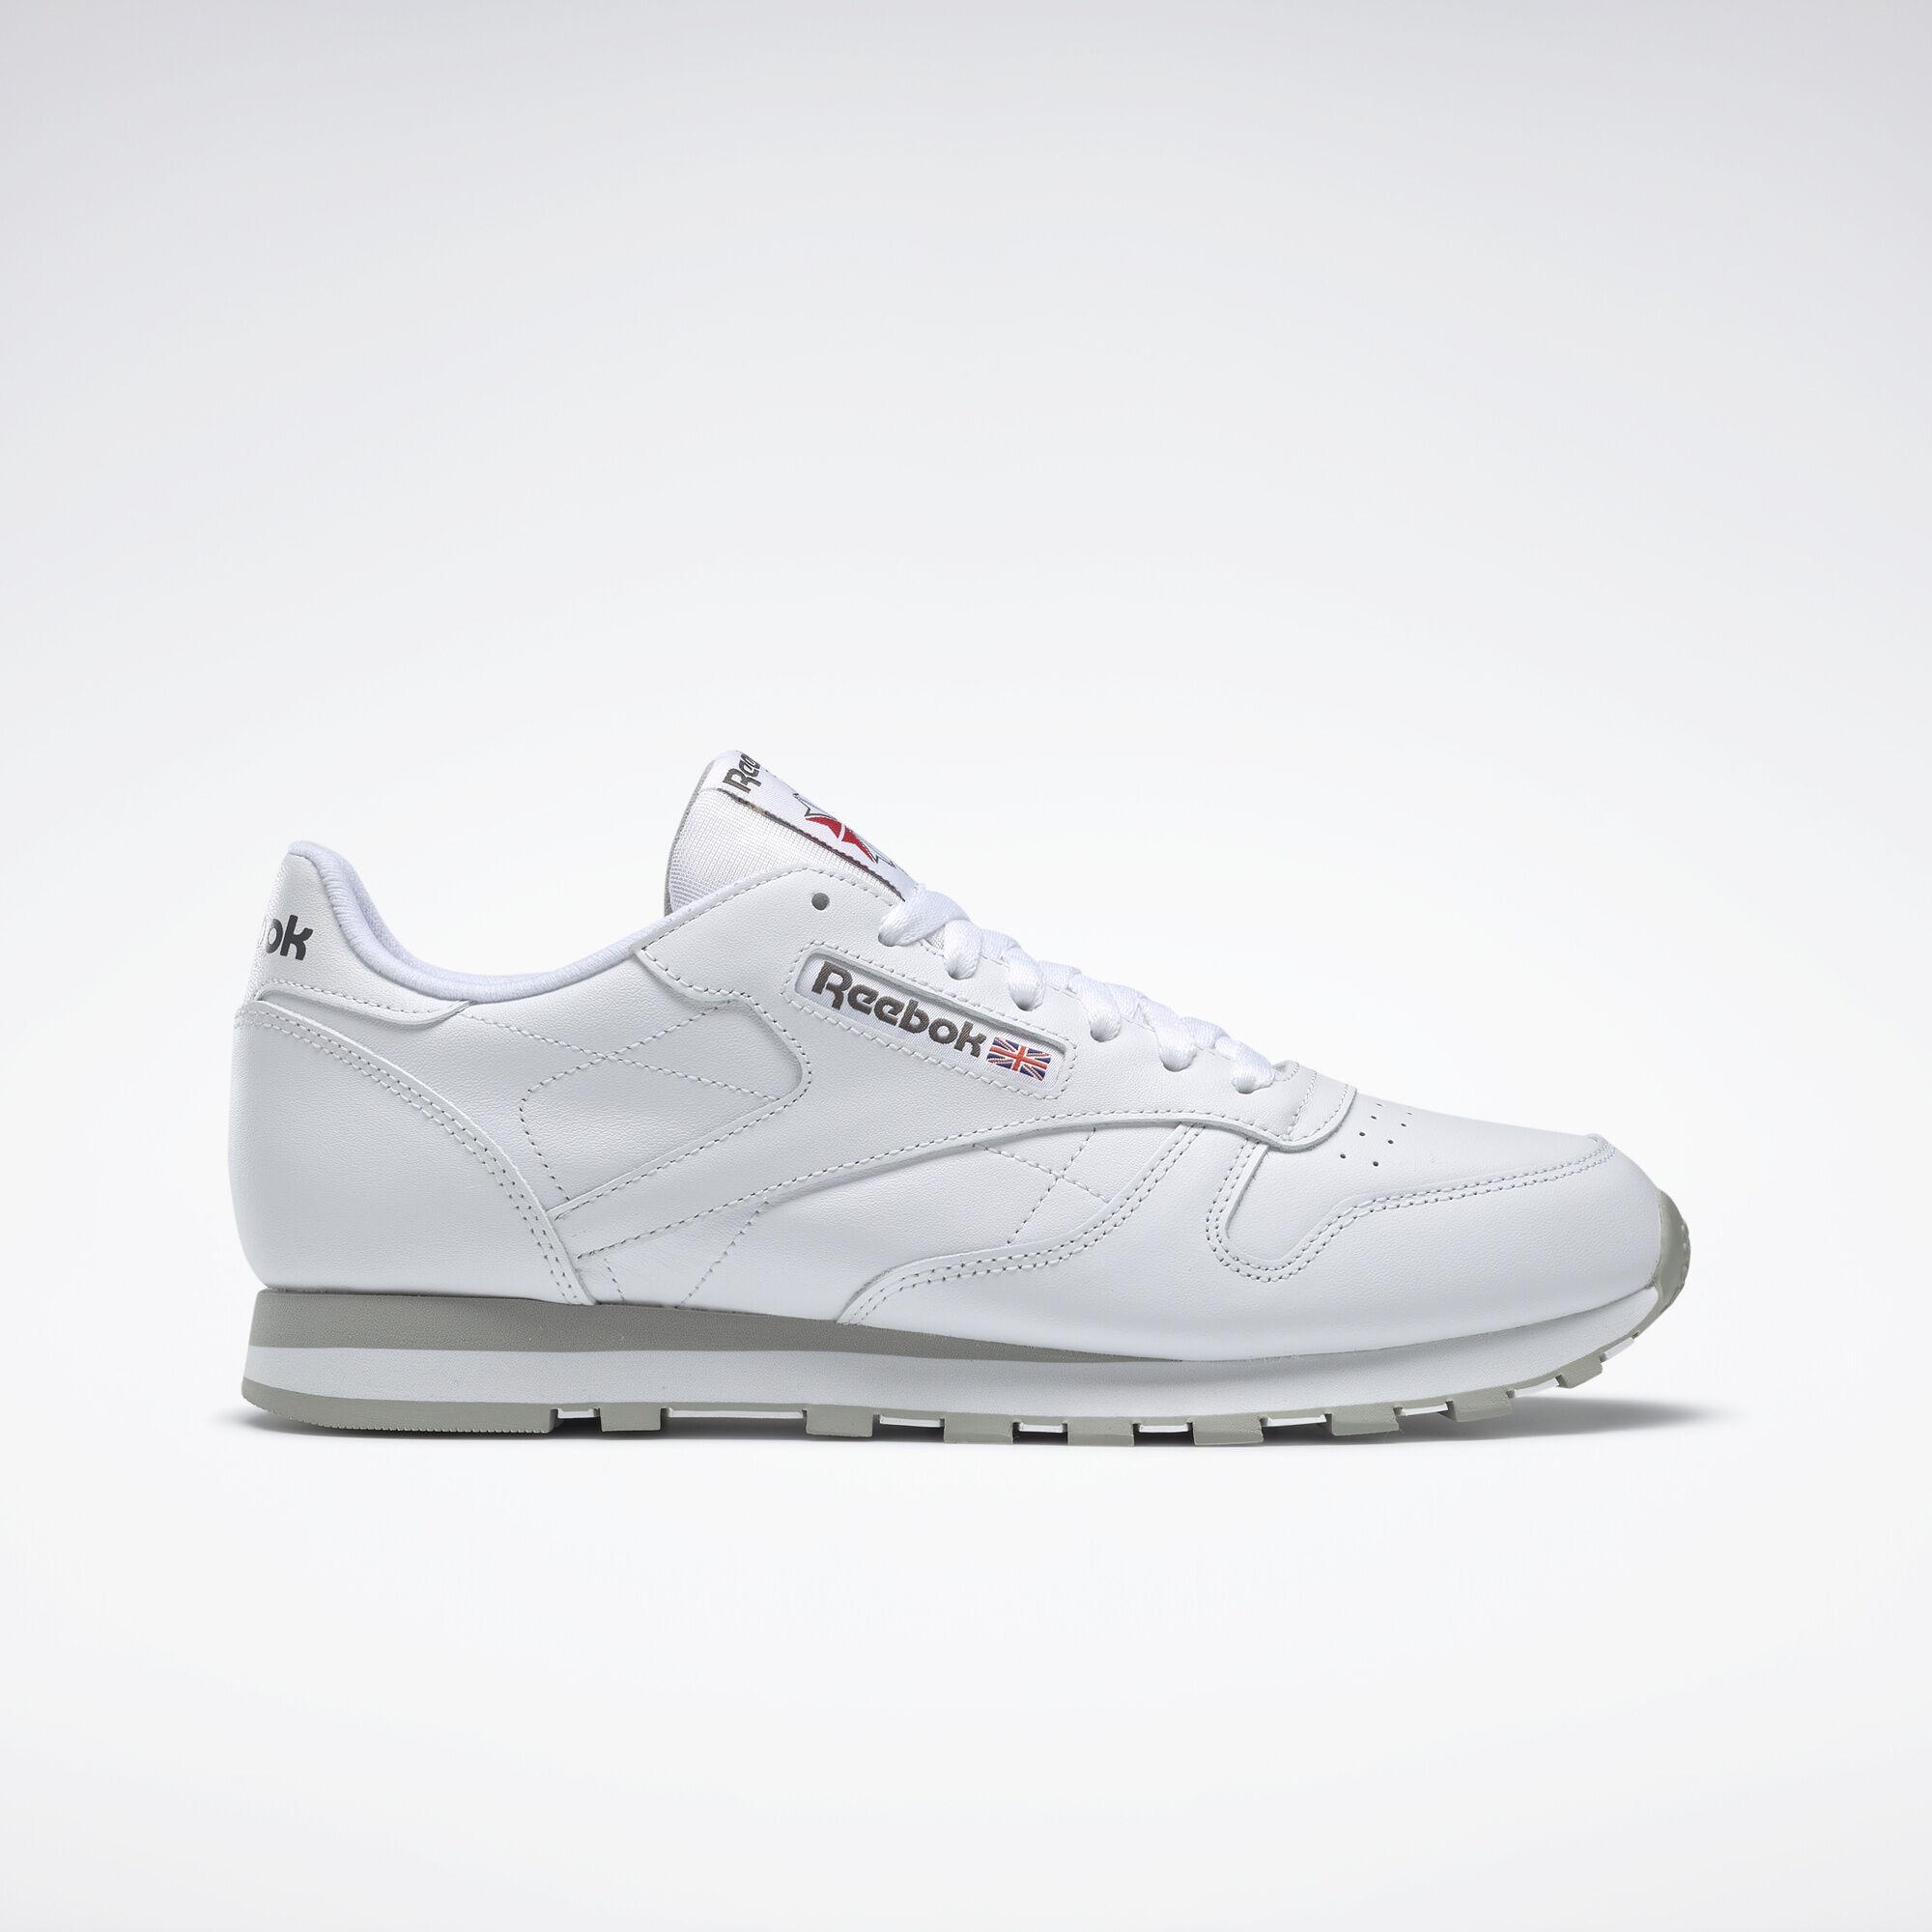 Reebok Classic Leather - White | Reebok MLT - photo#28